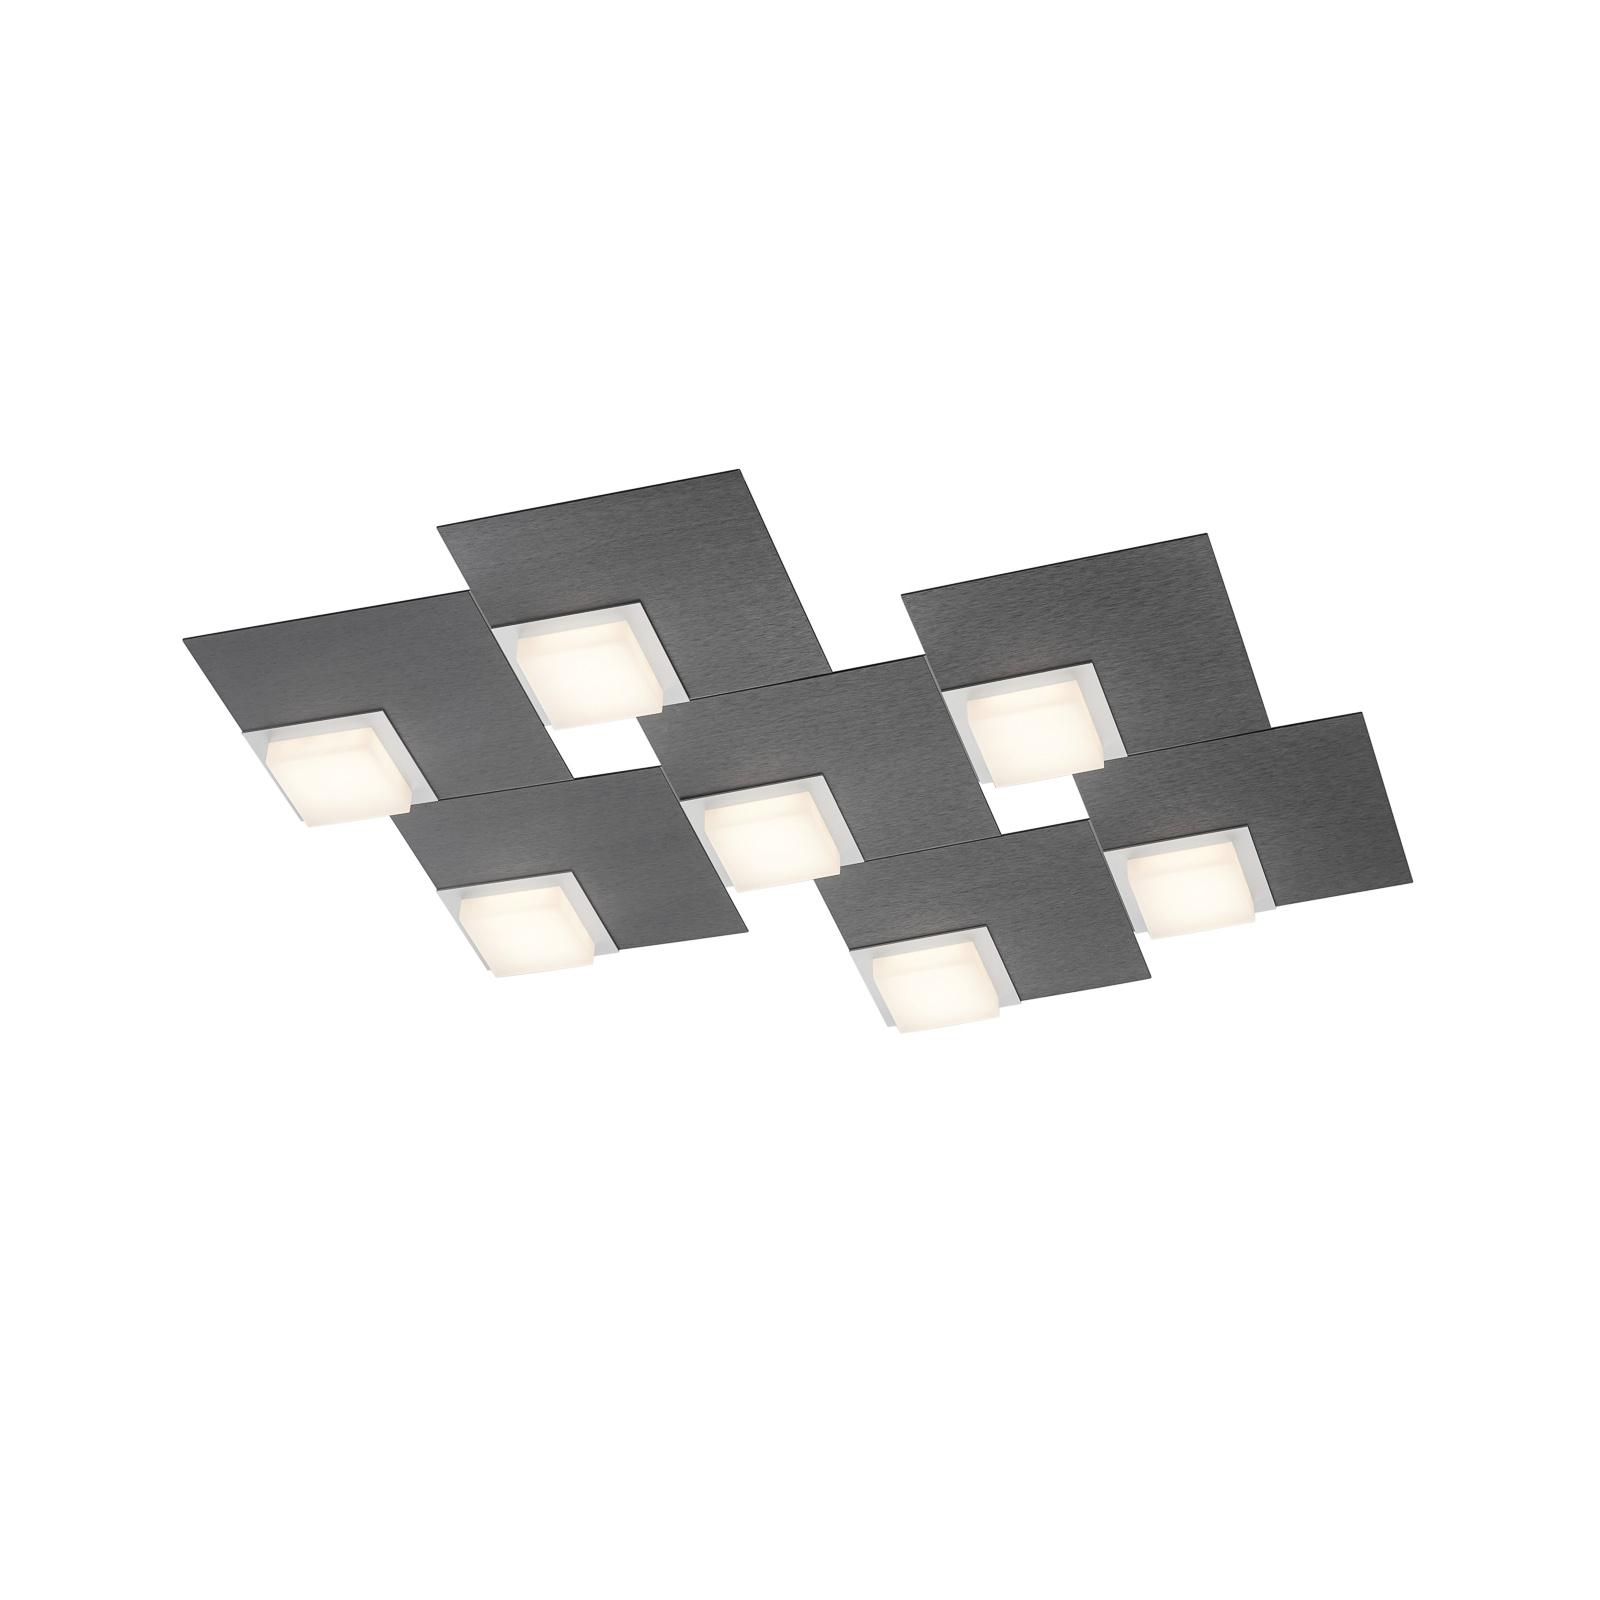 BANKAMP Quadro LED-loftlampe 64 W, antracit